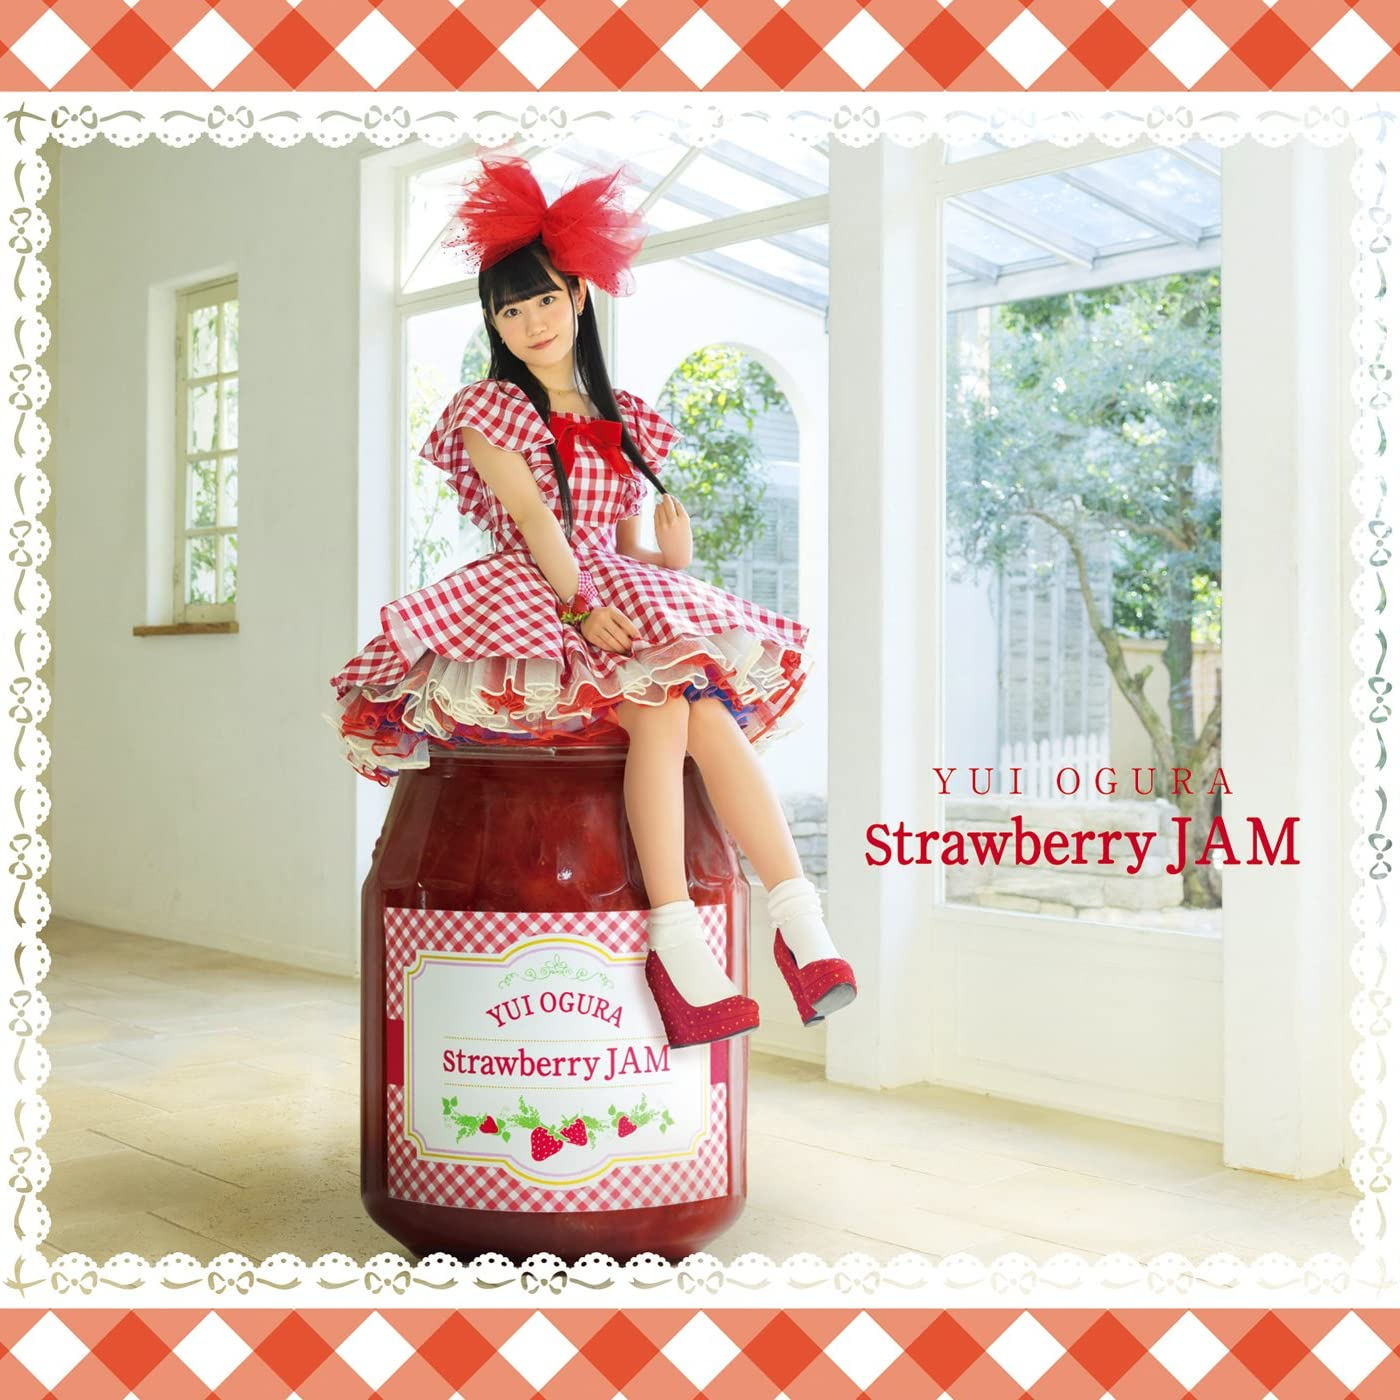 女性声優 - Strawberry JAM